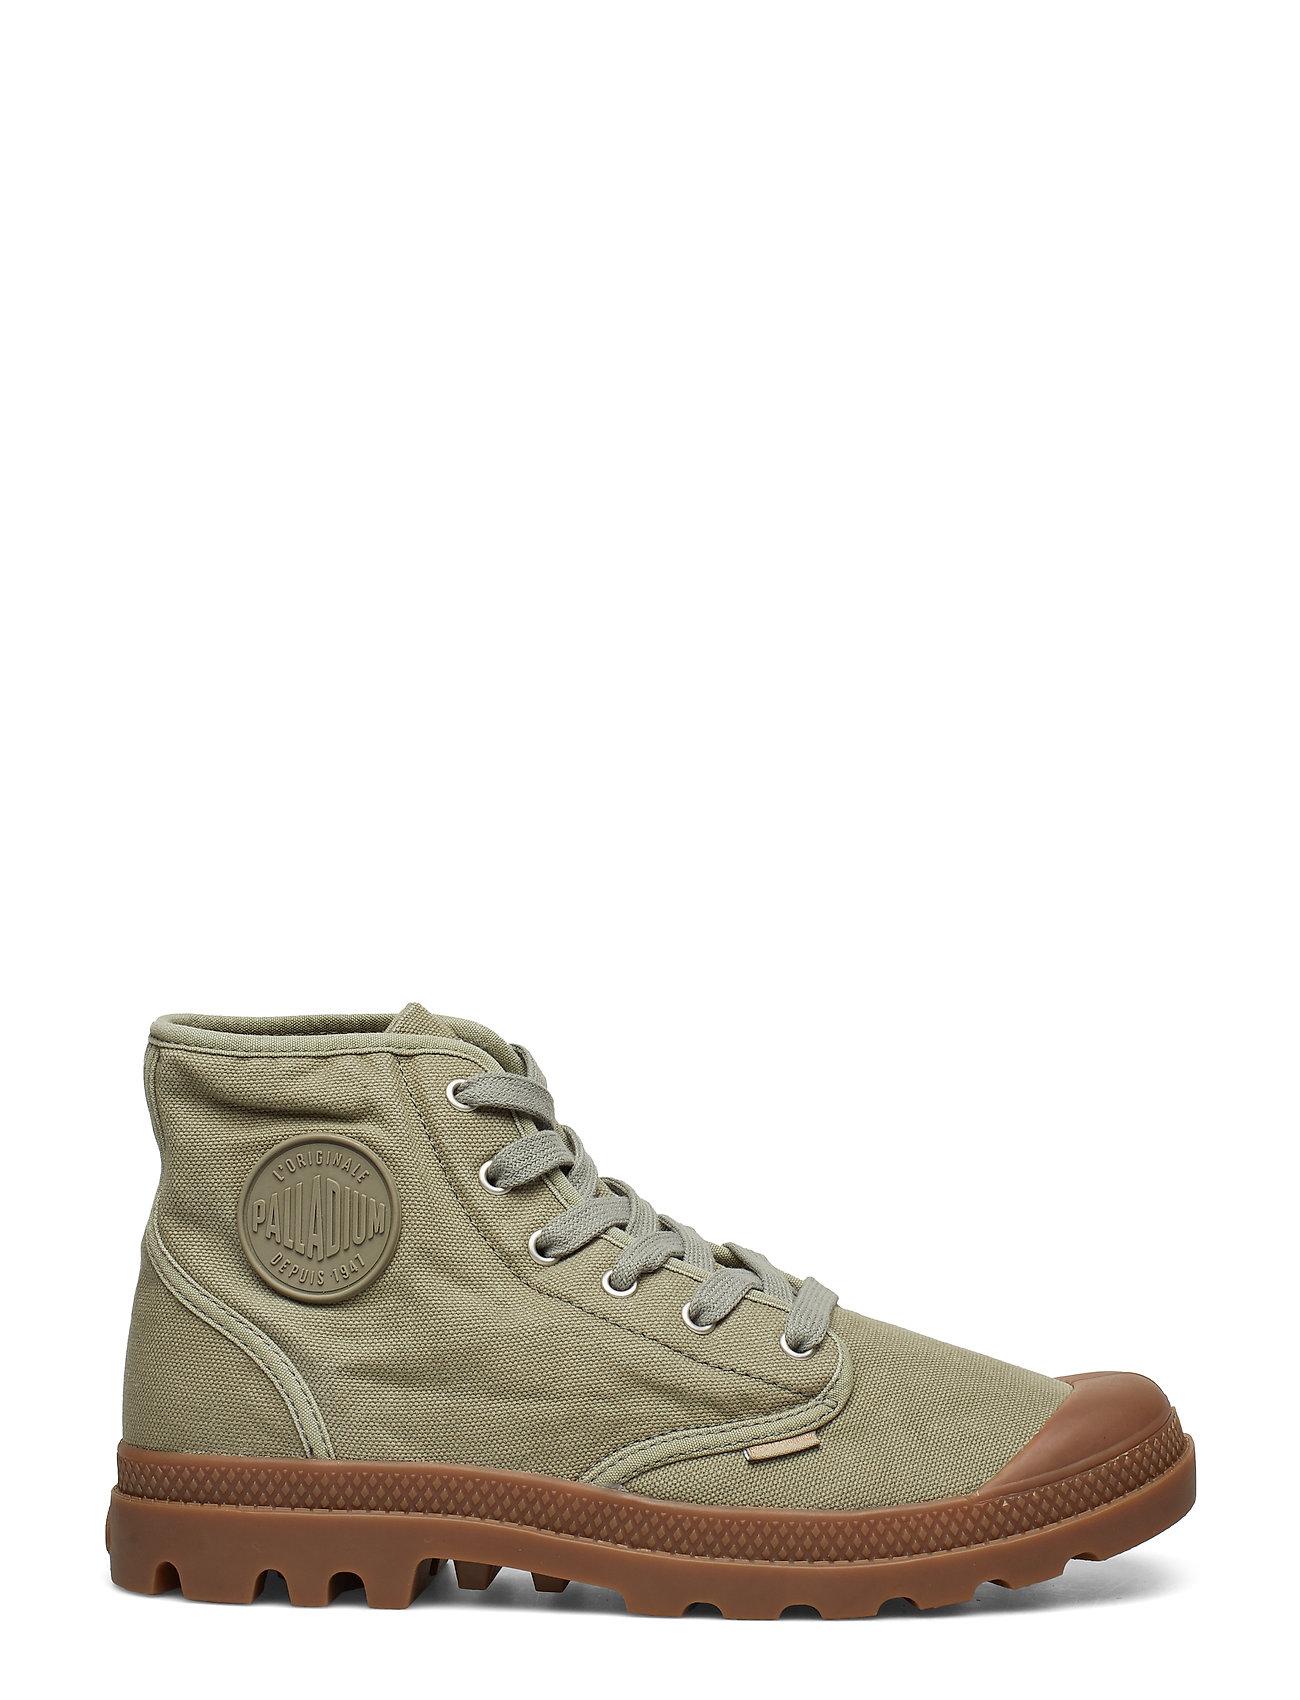 1fe0c2cc930 Palladium sneakers – Pampa Hi Men til herre i Sort - Pashion.dk